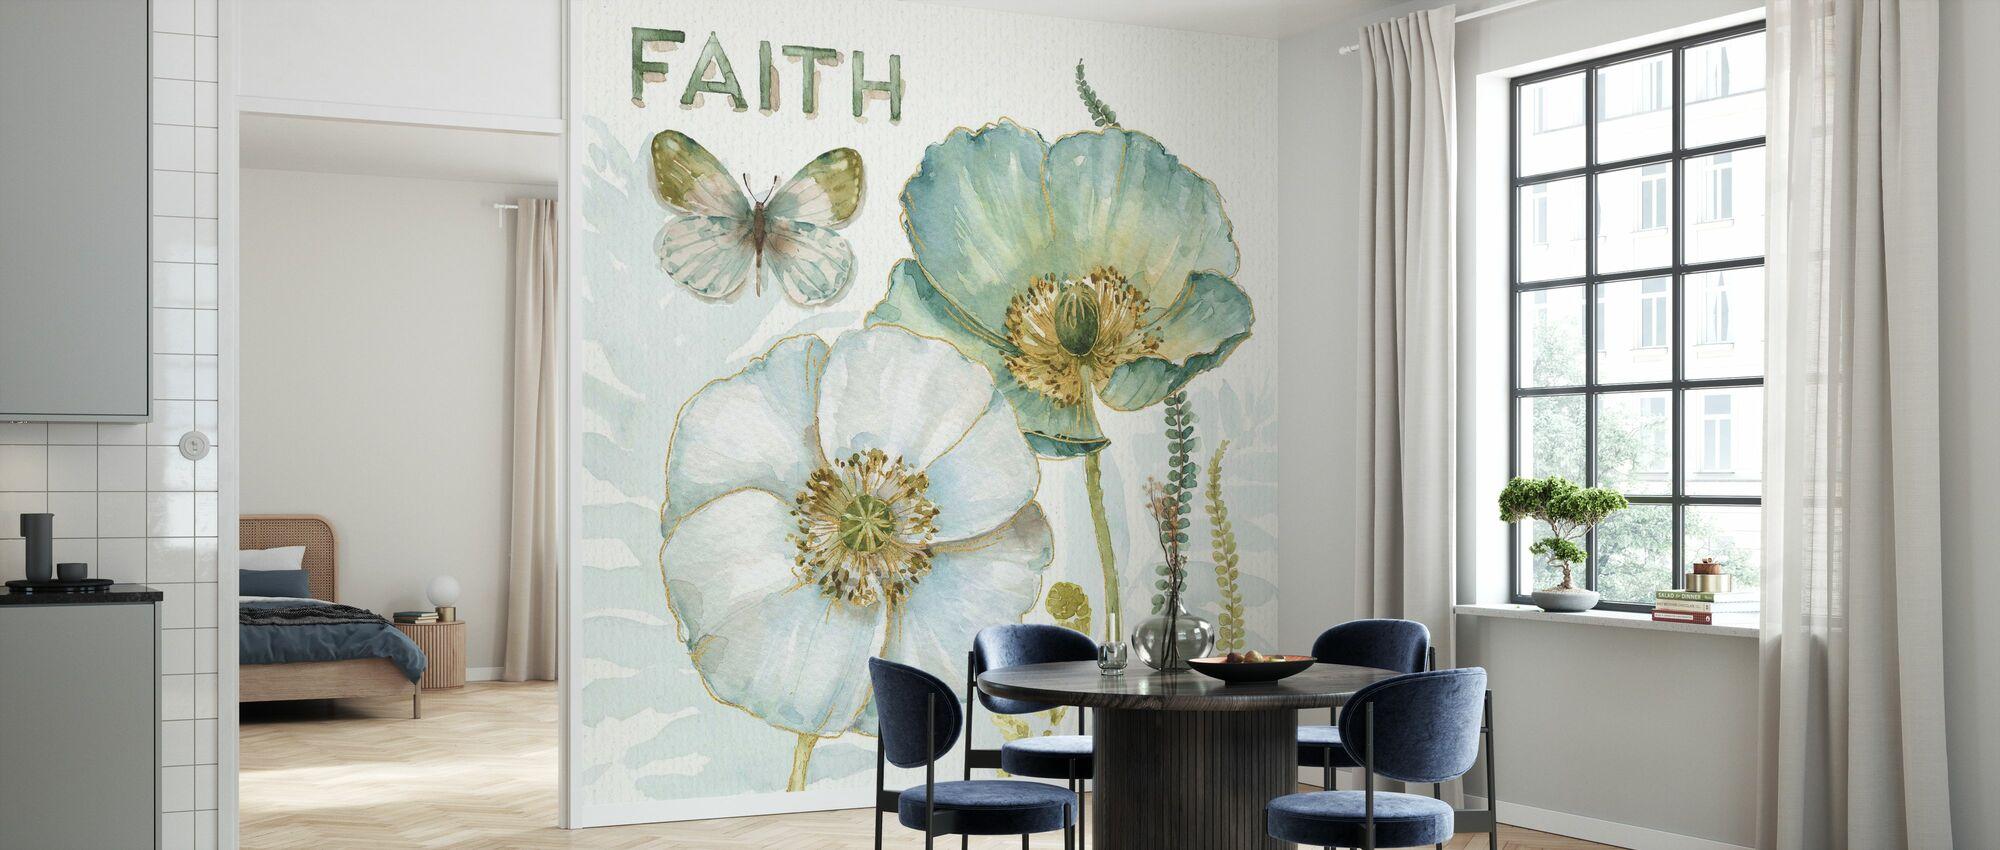 My Greenhouse Flowers - Faith - Wallpaper - Kitchen